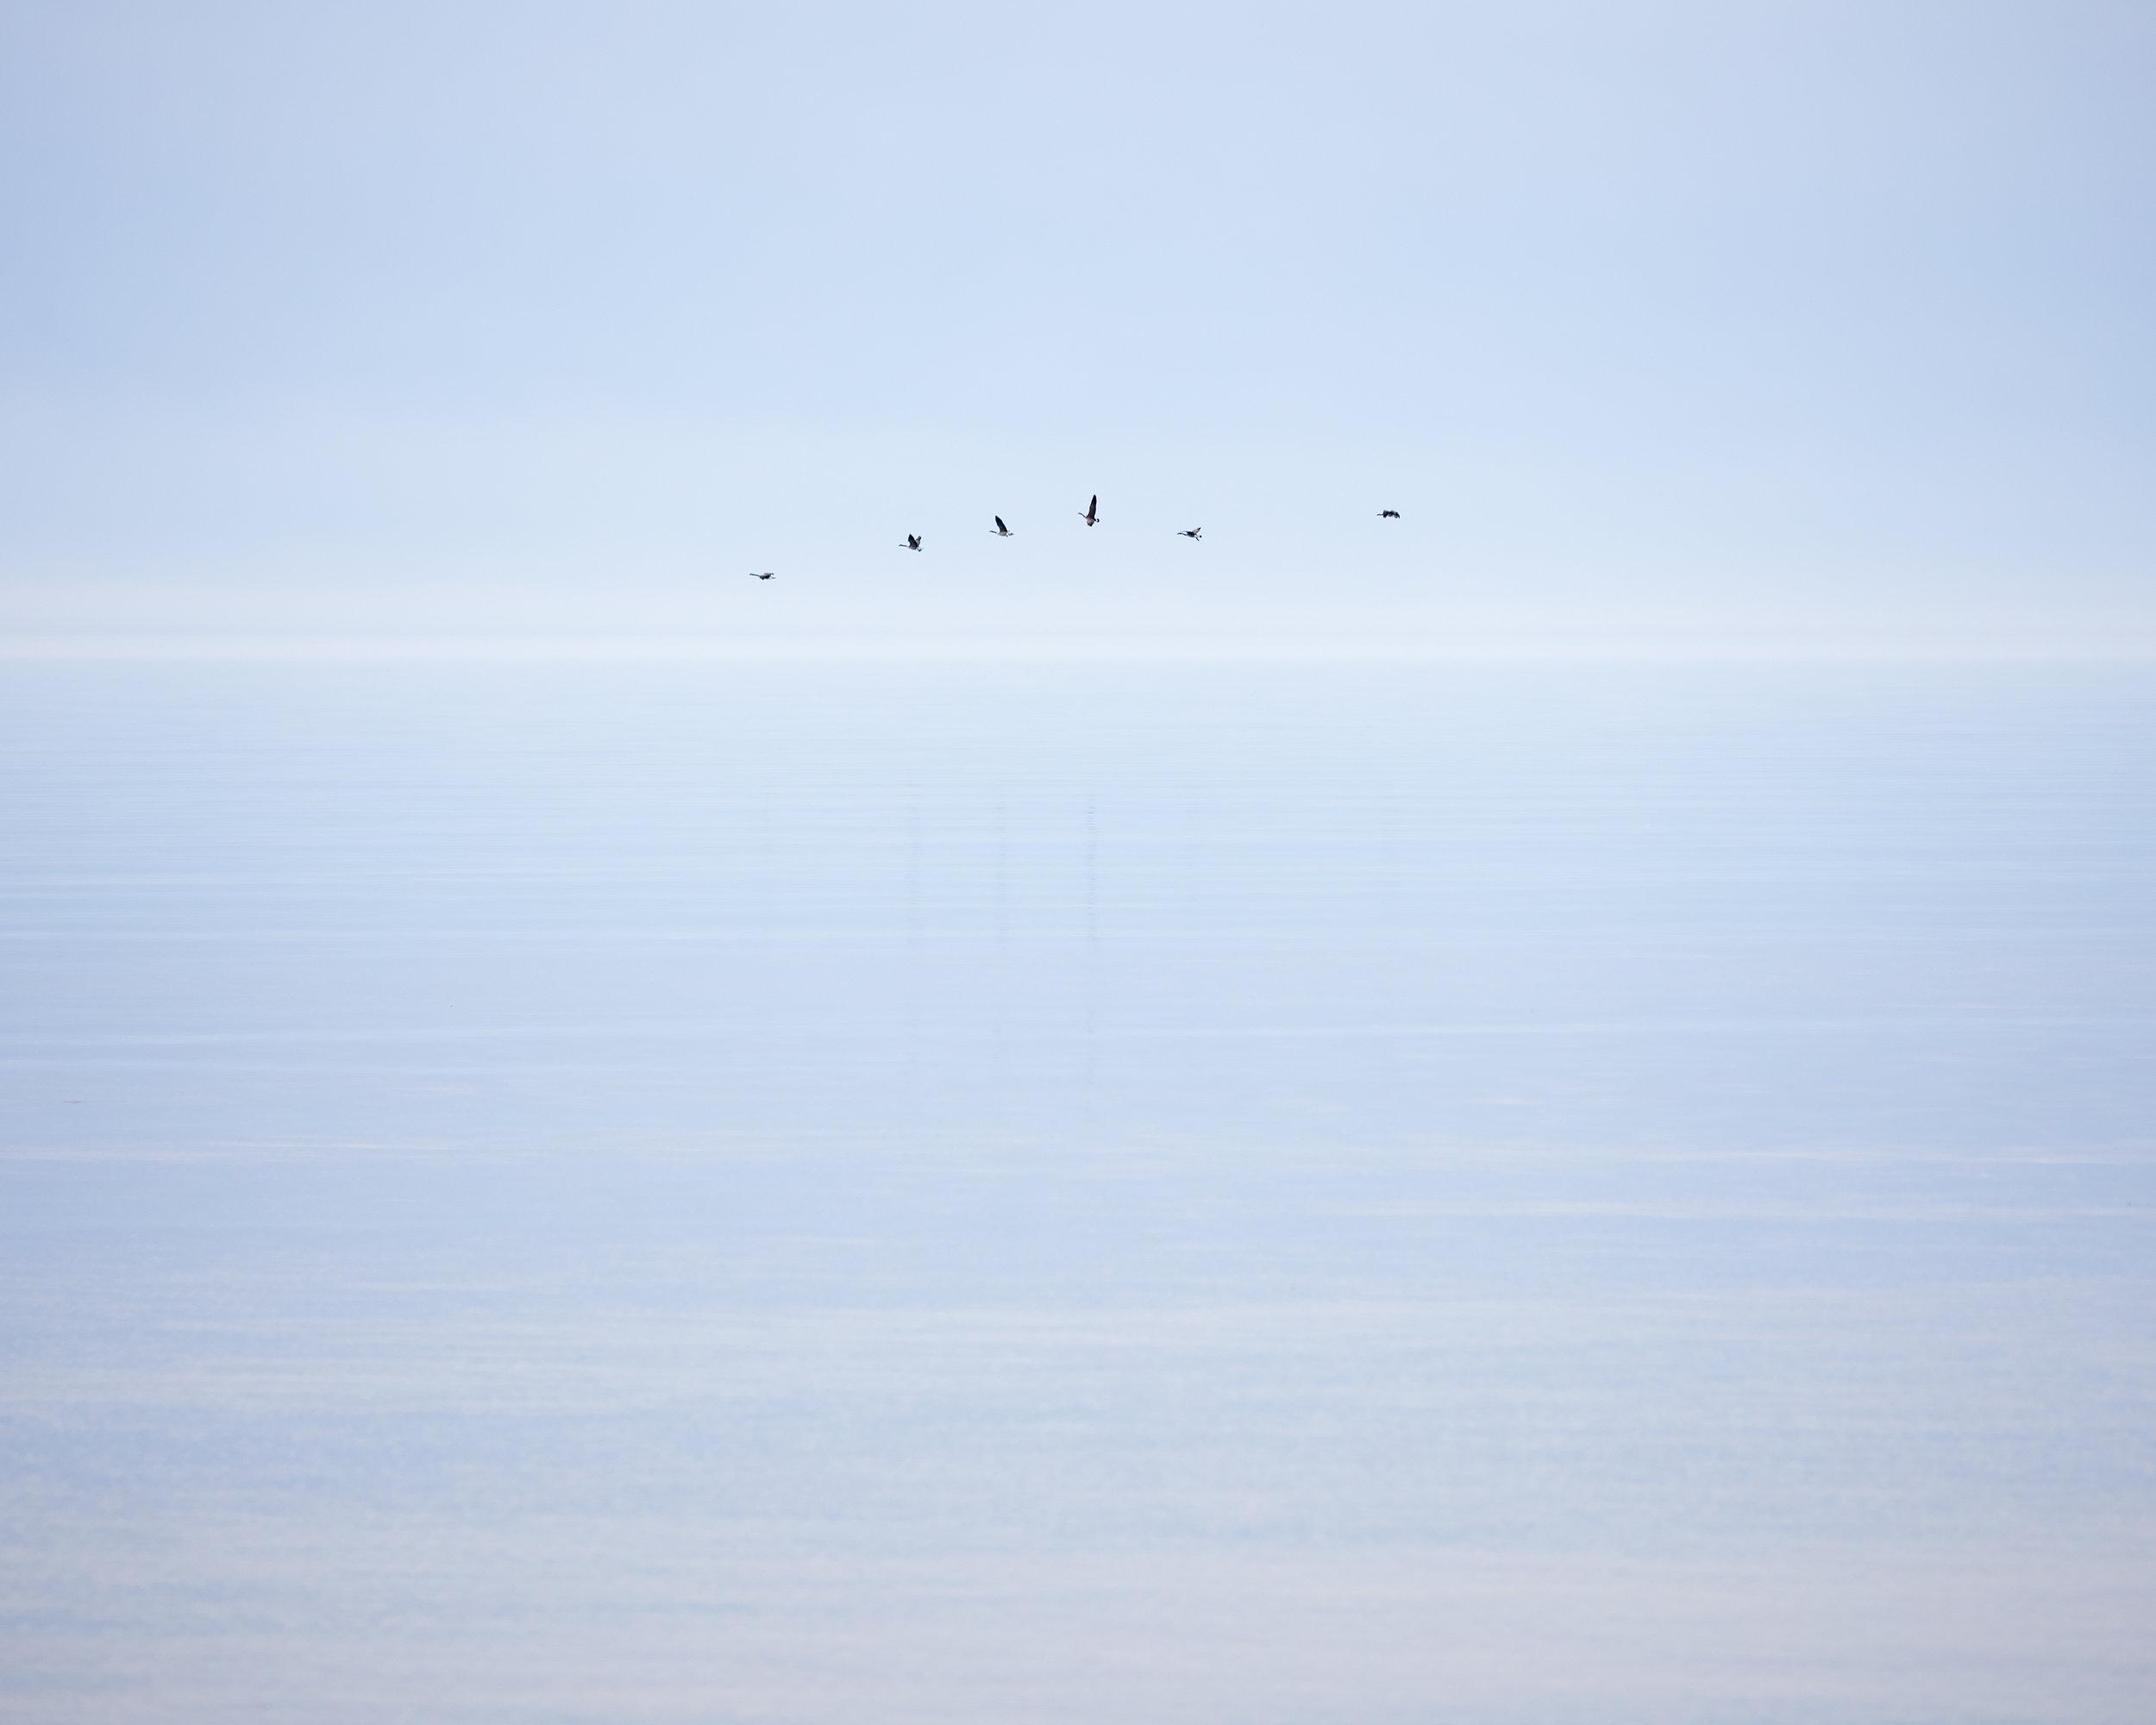 Six Geese, Algoma, Wisconsin, 2017